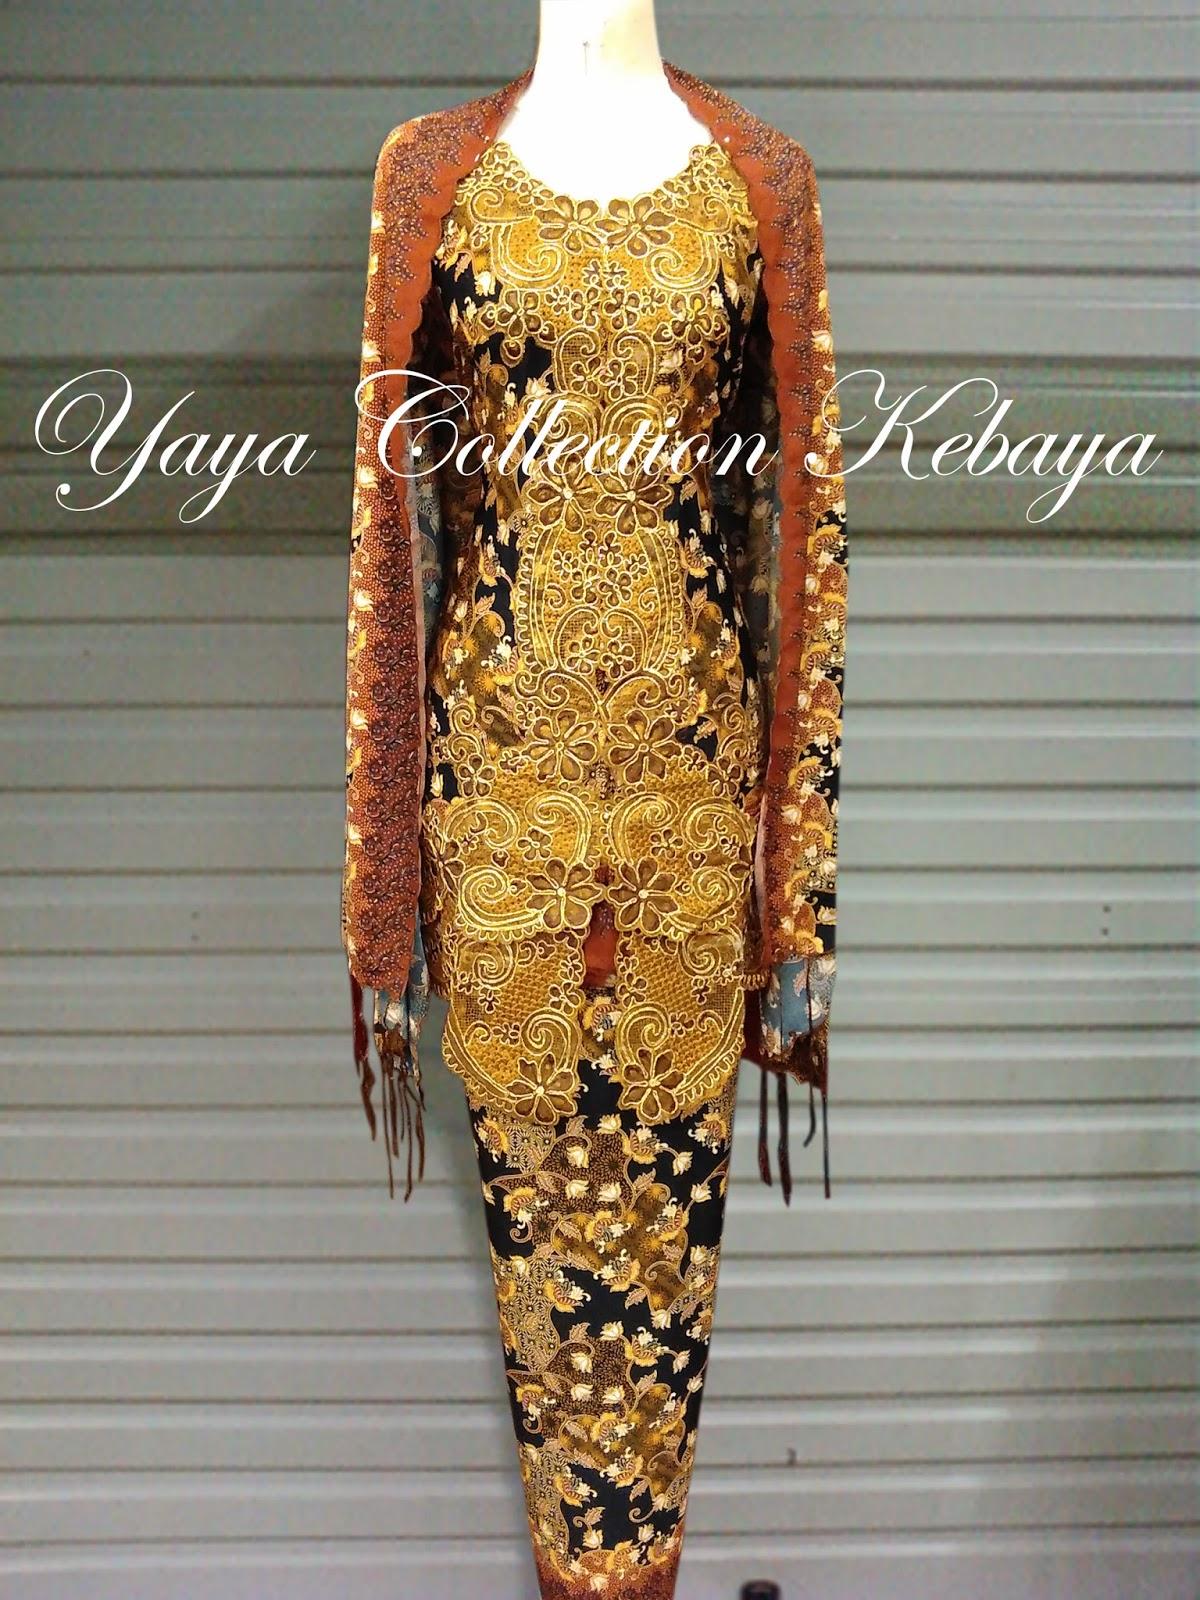 Jual Kebaya Sabrina Batik Modern Yaya Online Shop Toko Selenddang